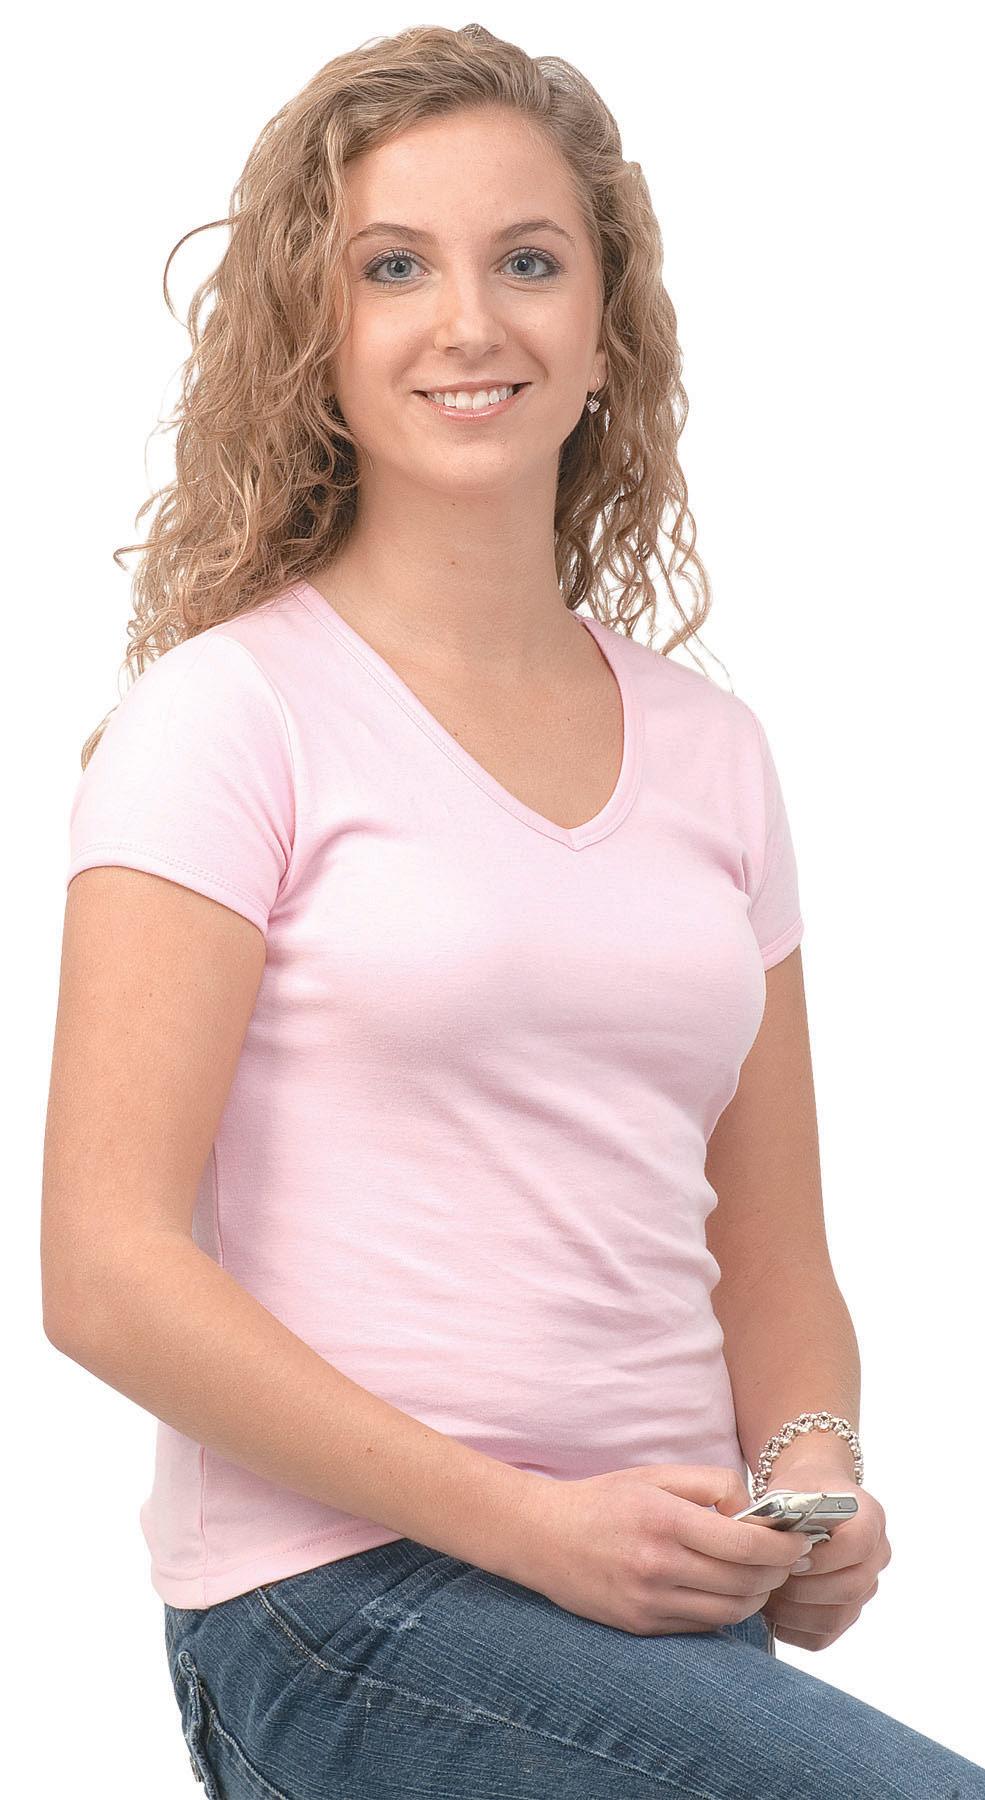 Monag 561016 - Interlock Short Sleeve V-Neck Tee